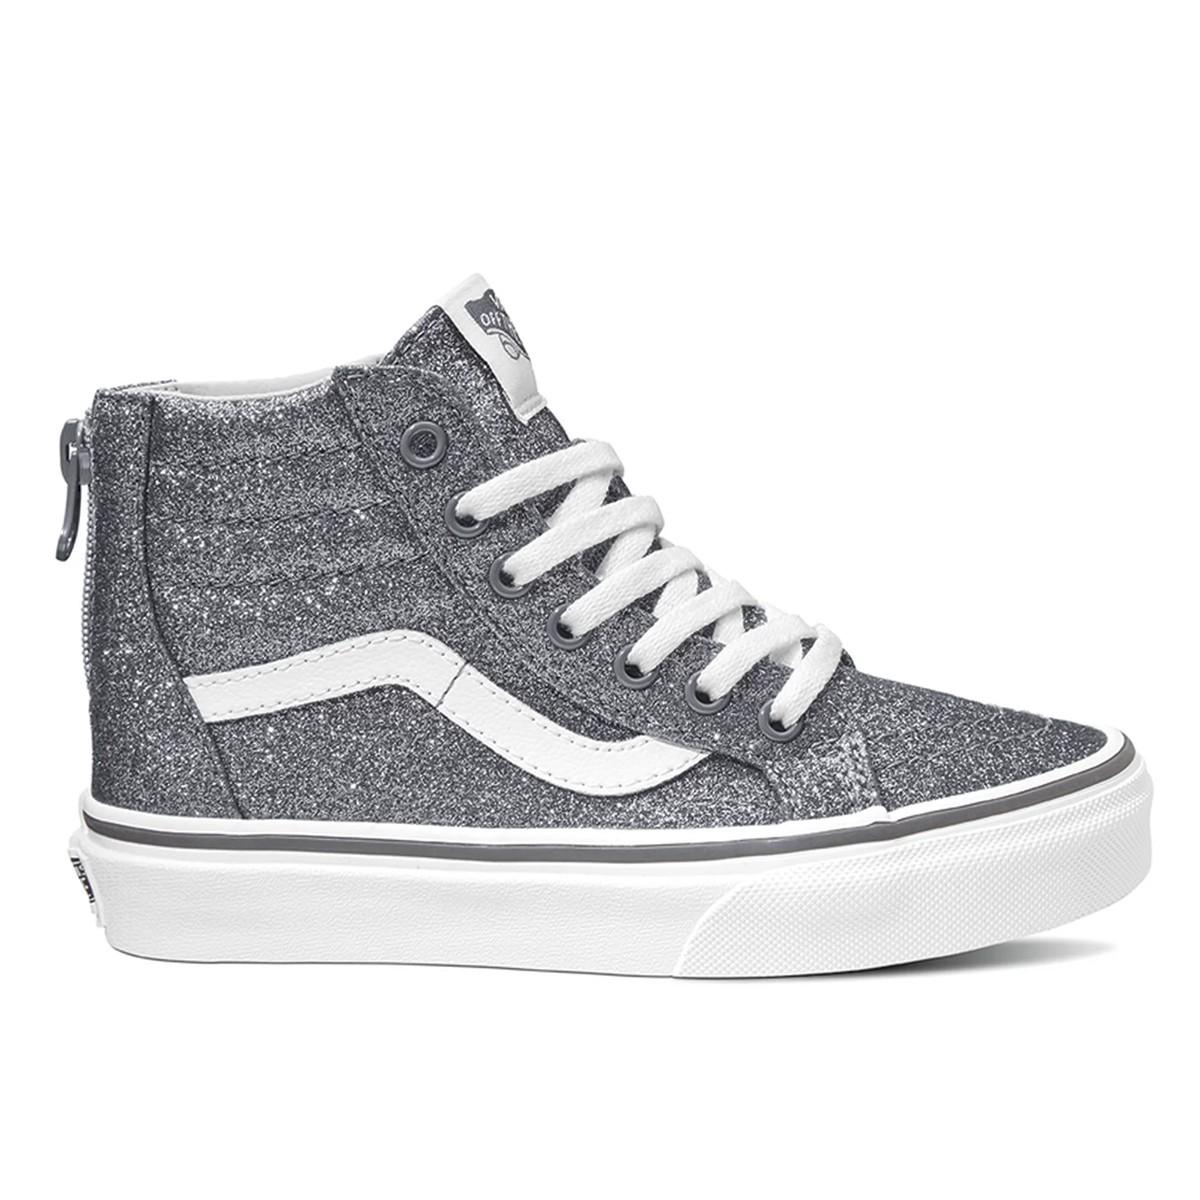 VANS Shoes SK8-Hi Zip (glitter) Pewter